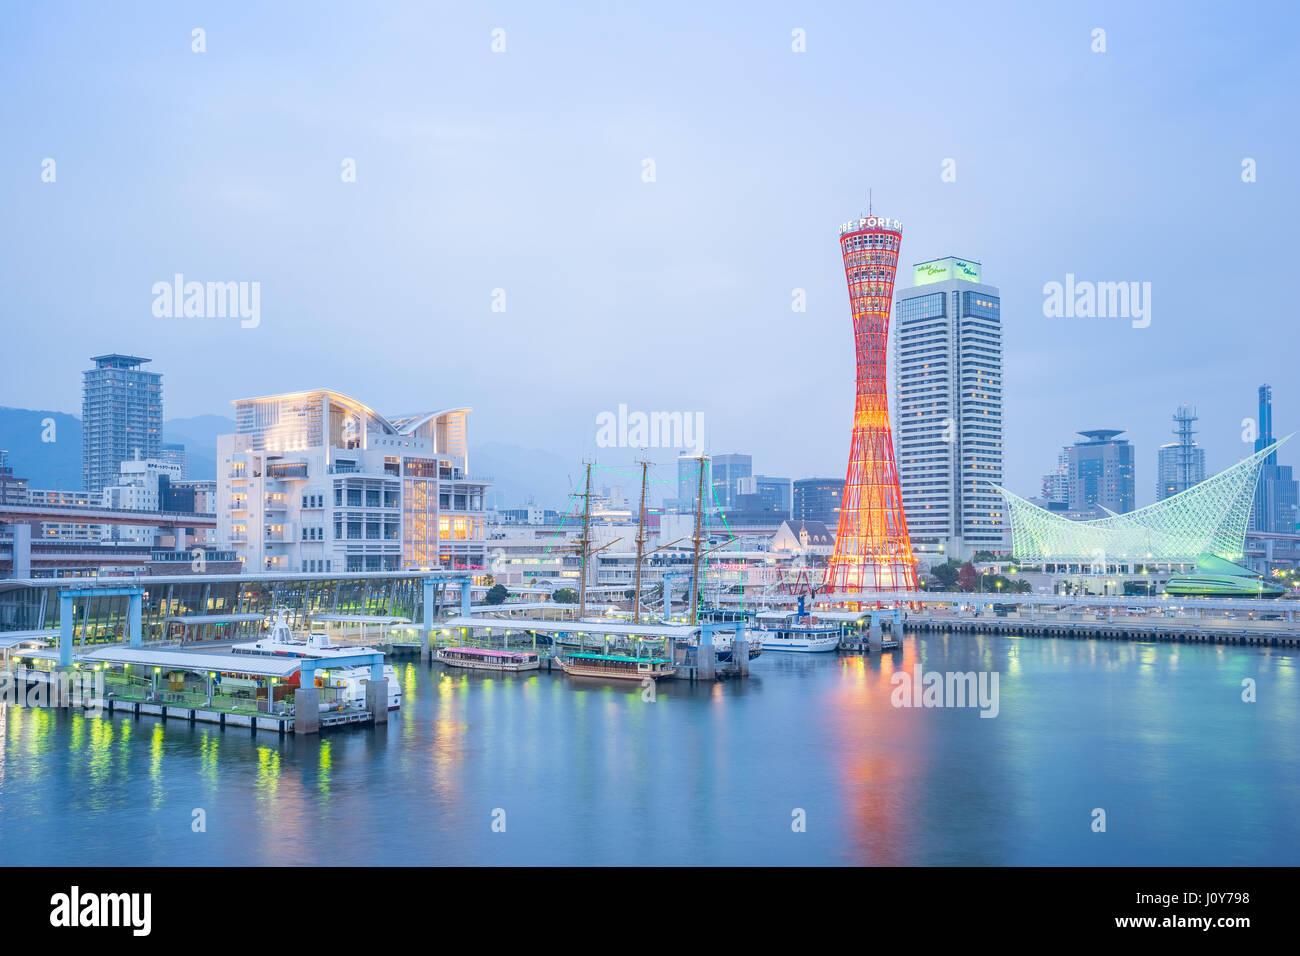 Kobe, Japan - January 5, 2016: Kobe port with Kobe tower in Japan. - Stock Image